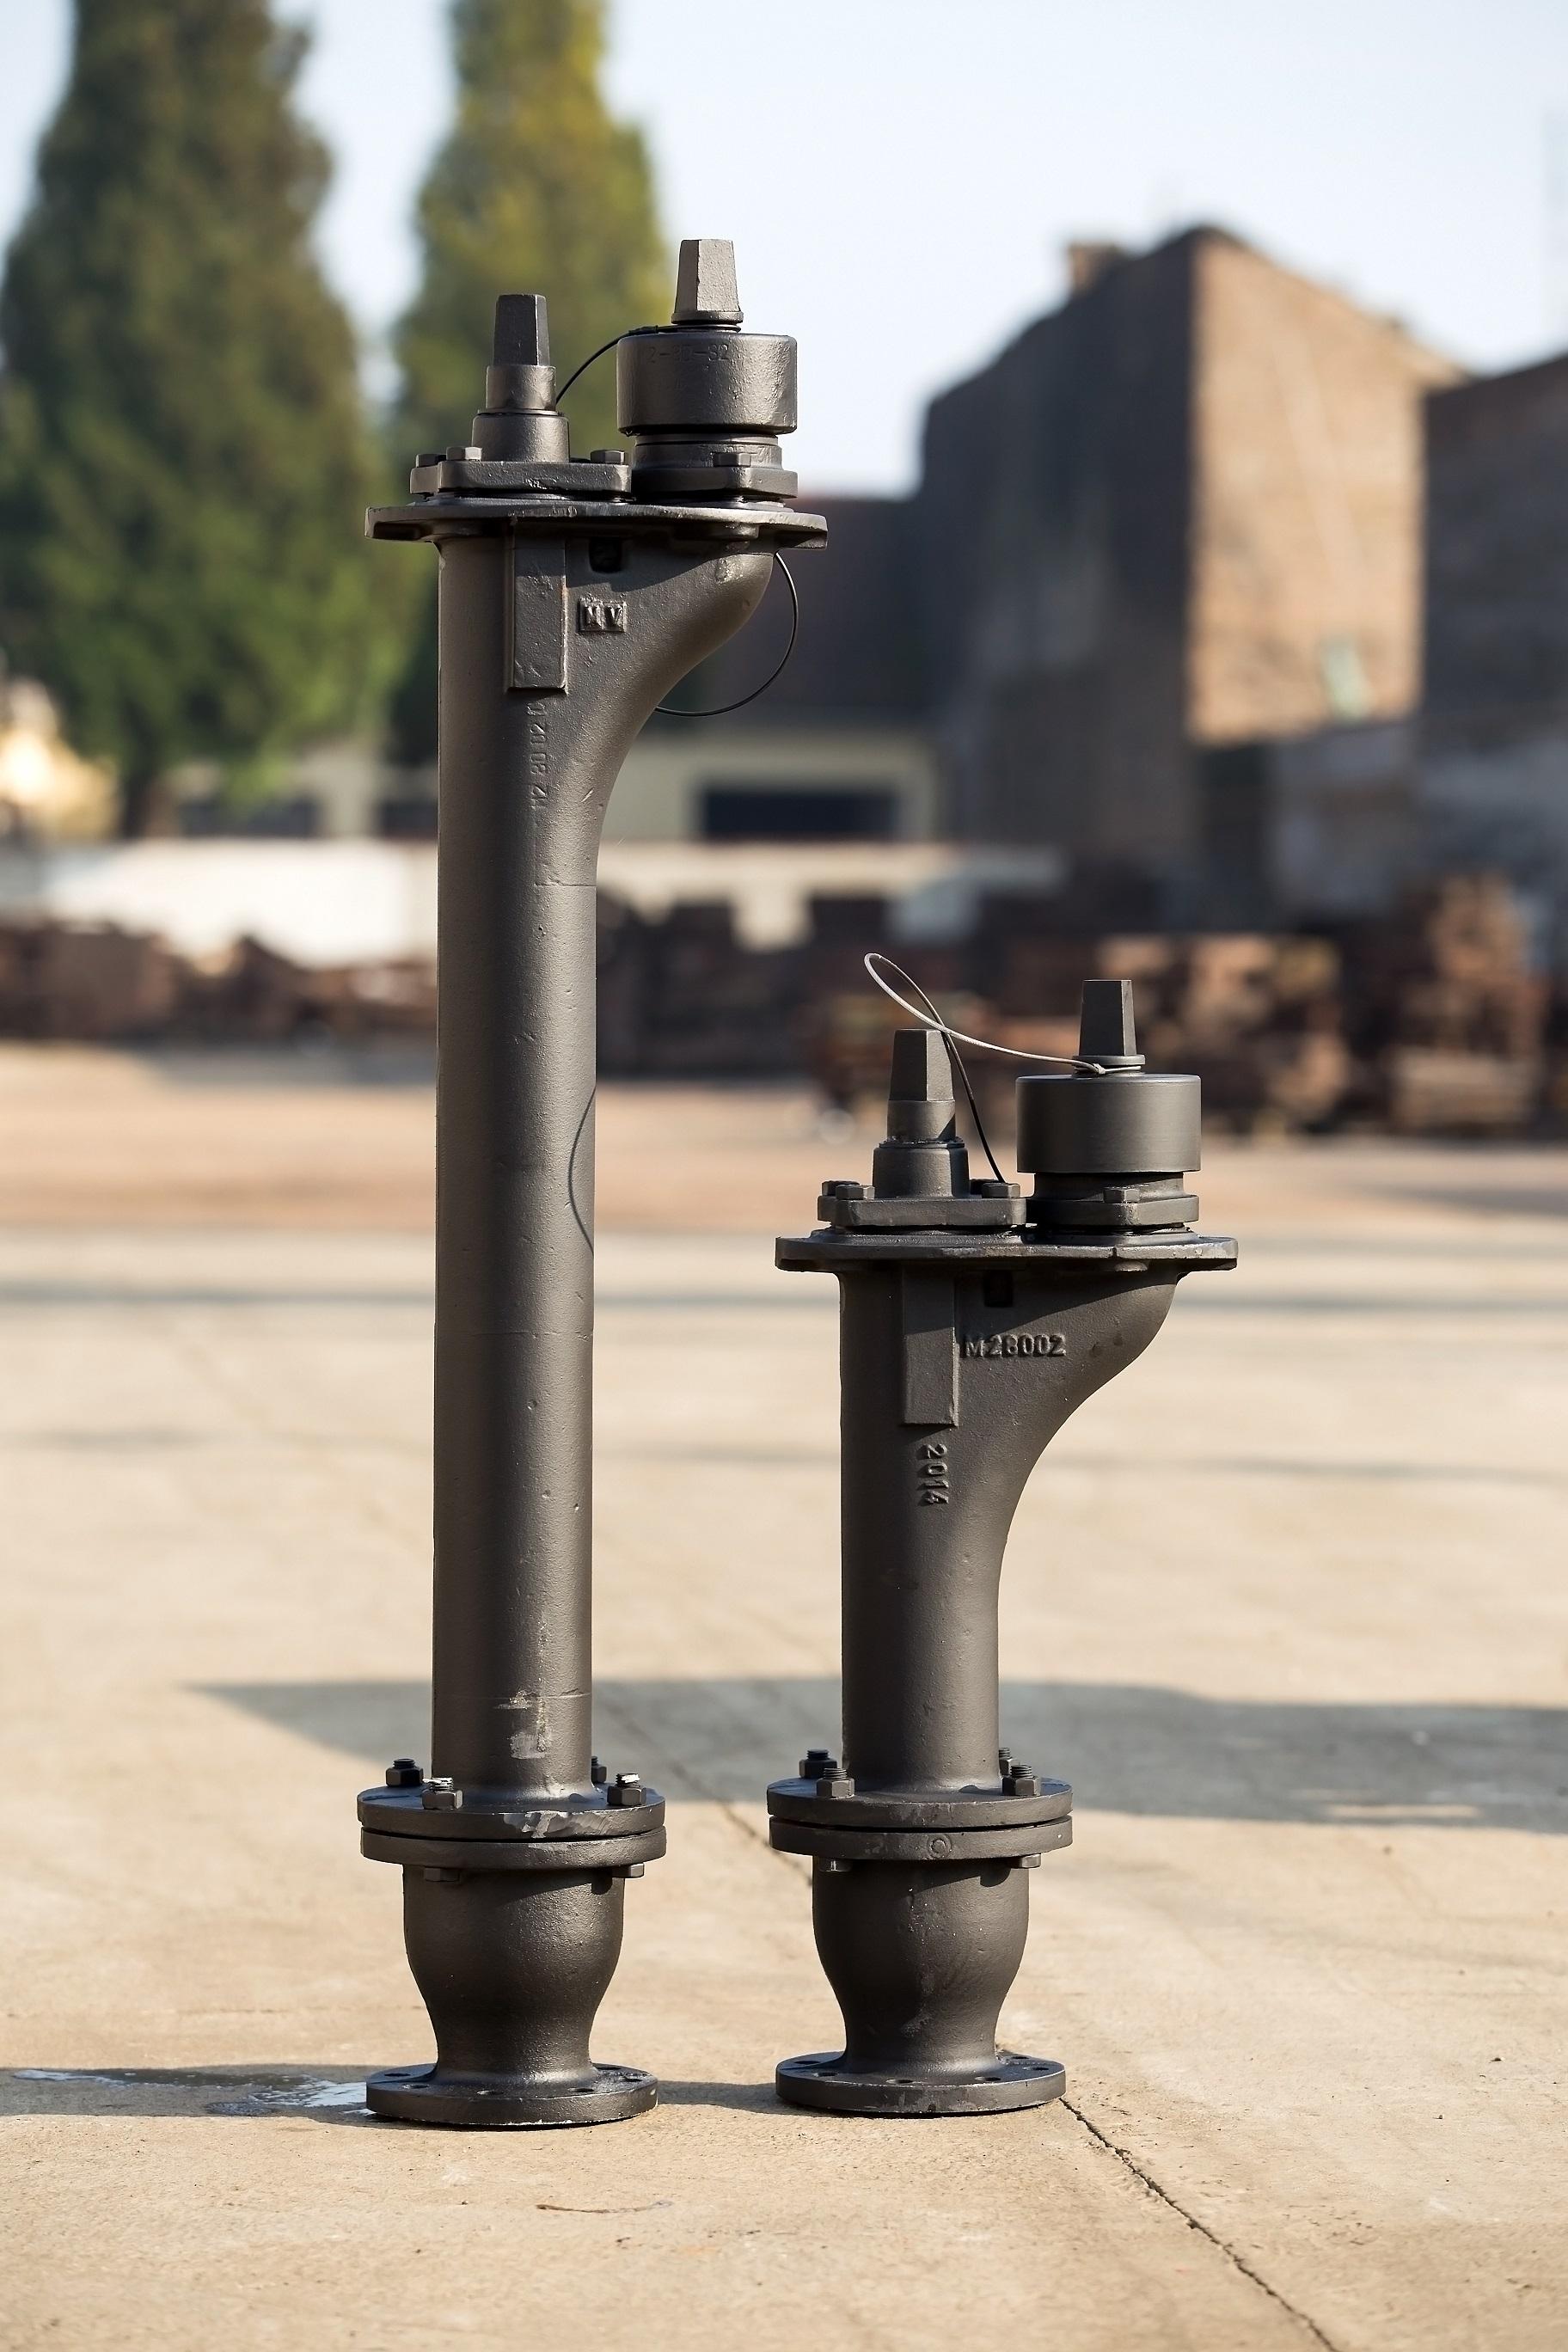 Underground Fire Hydrant Moh 225 Csi Vas 246 Nt 246 De